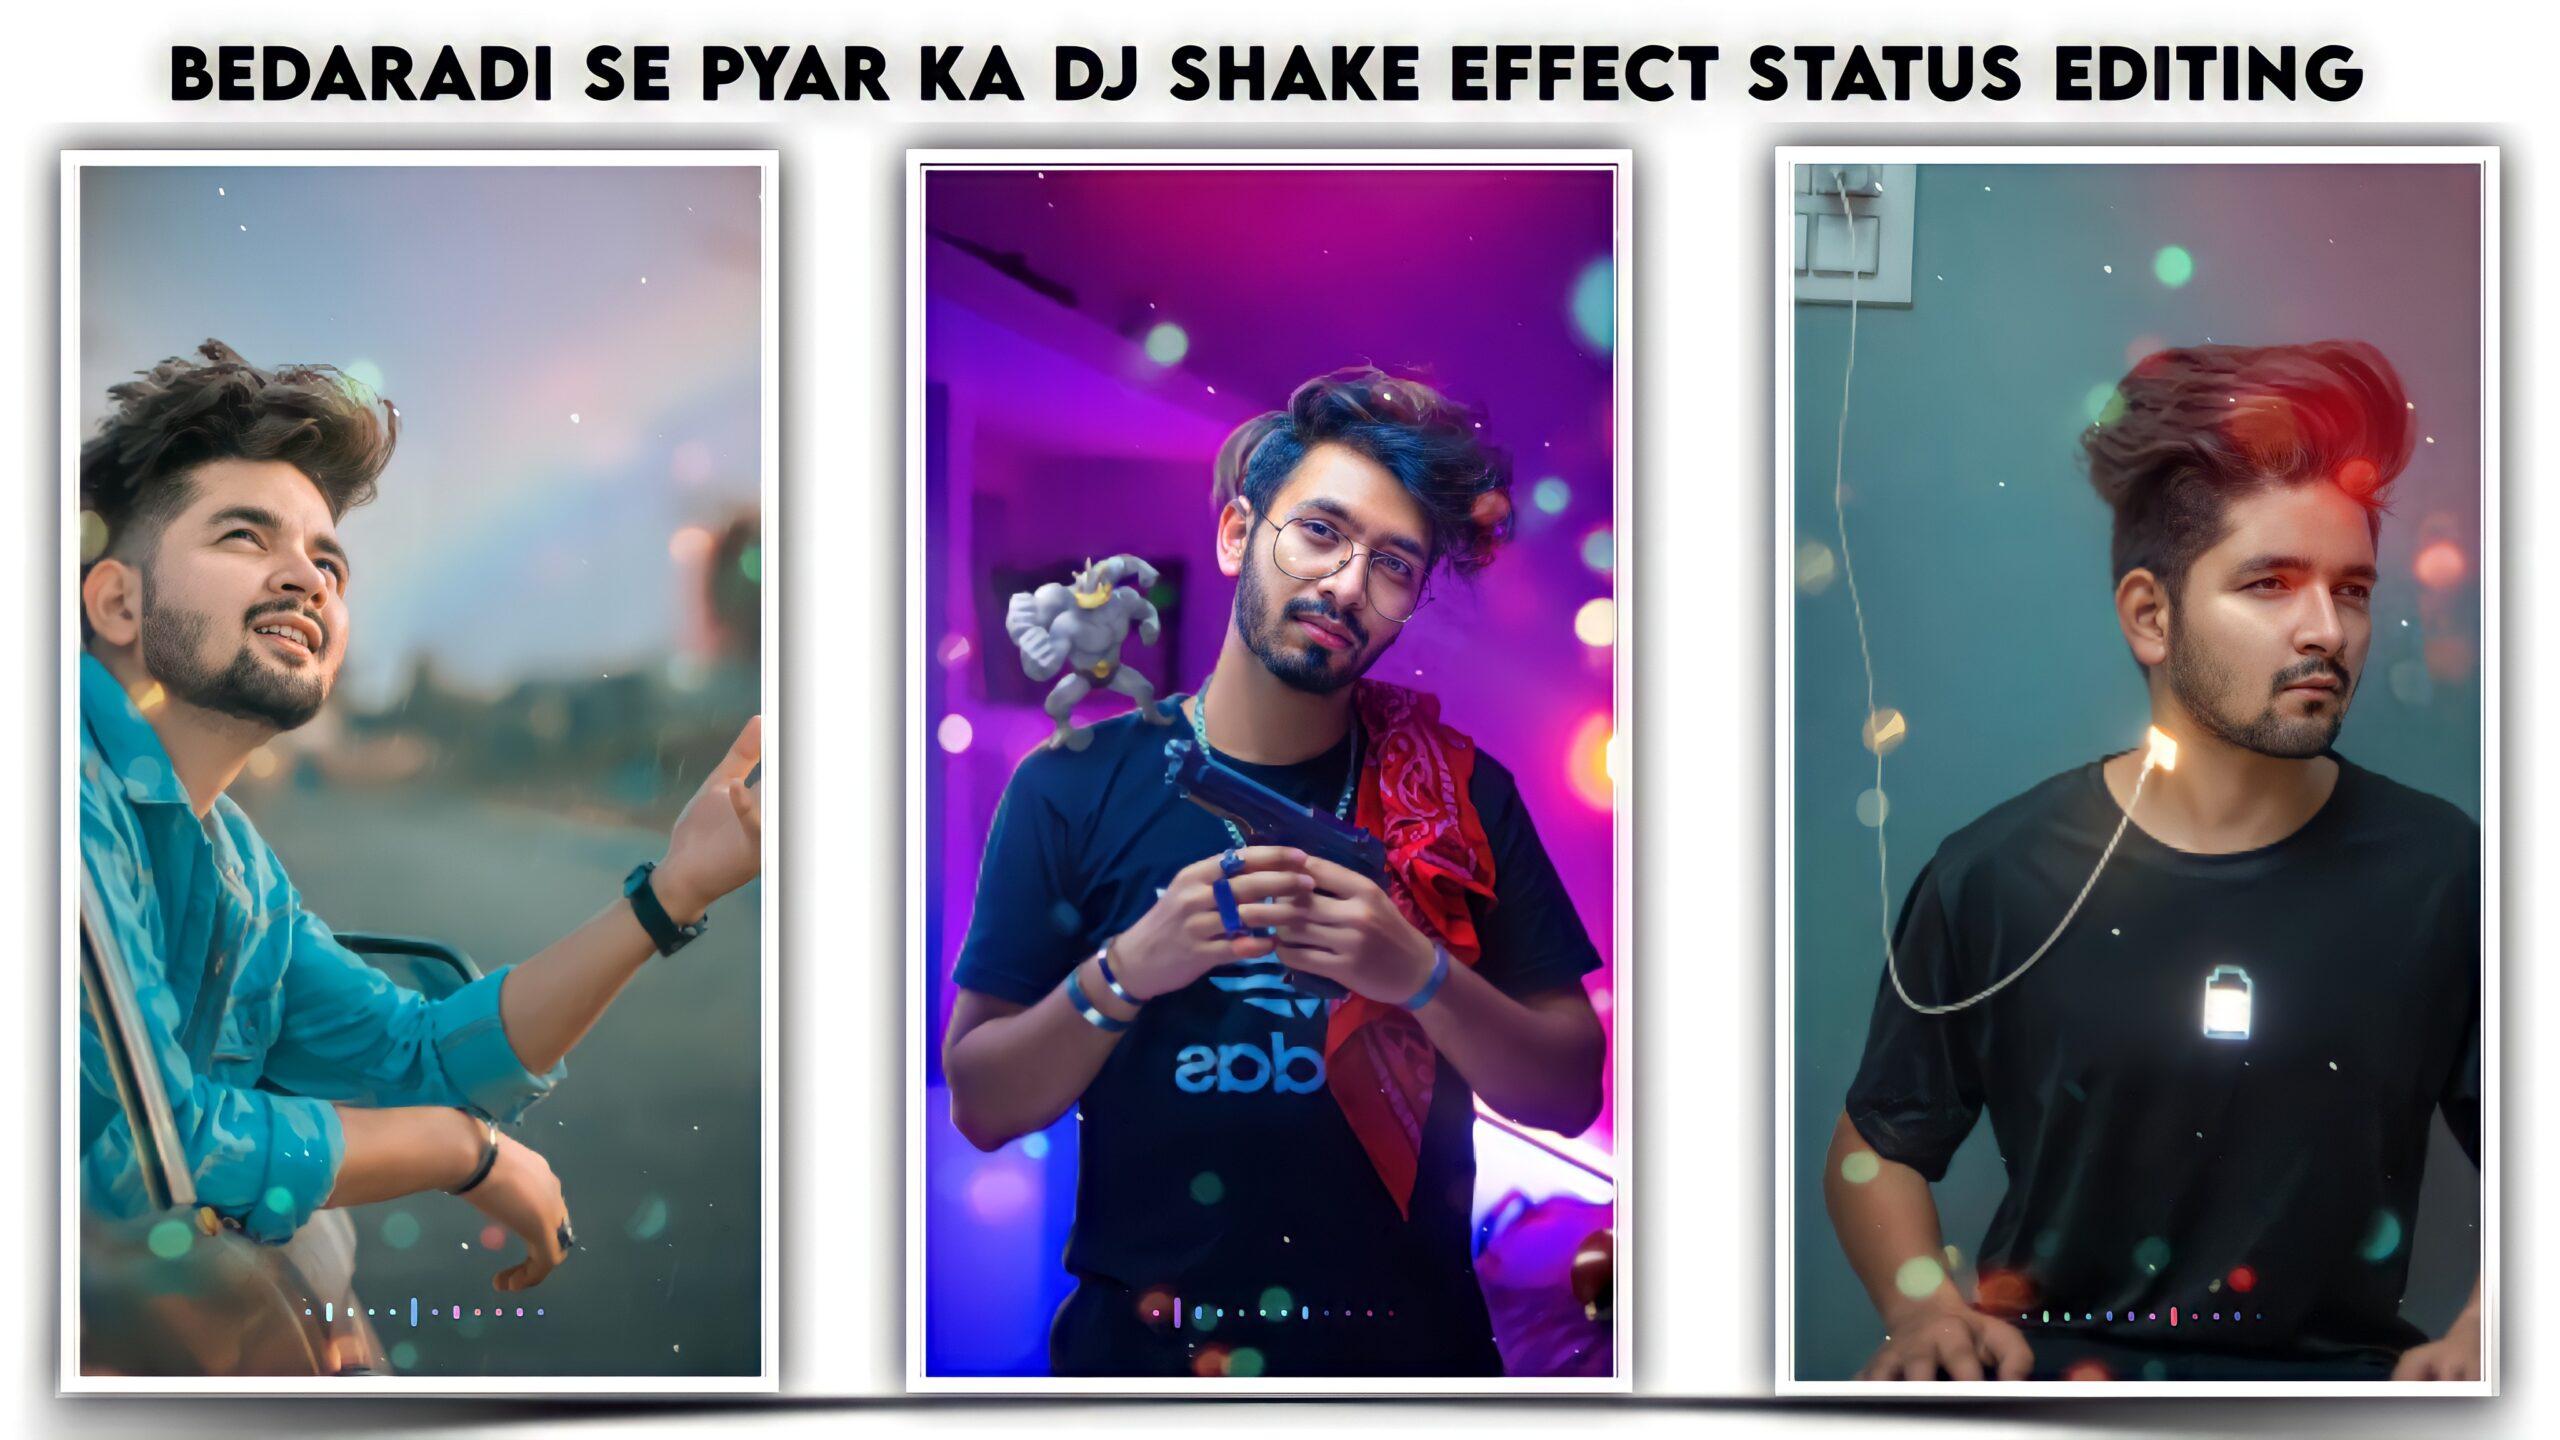 Bedaradi se pyar ka Dj Remix Shake Effect editing 2021.